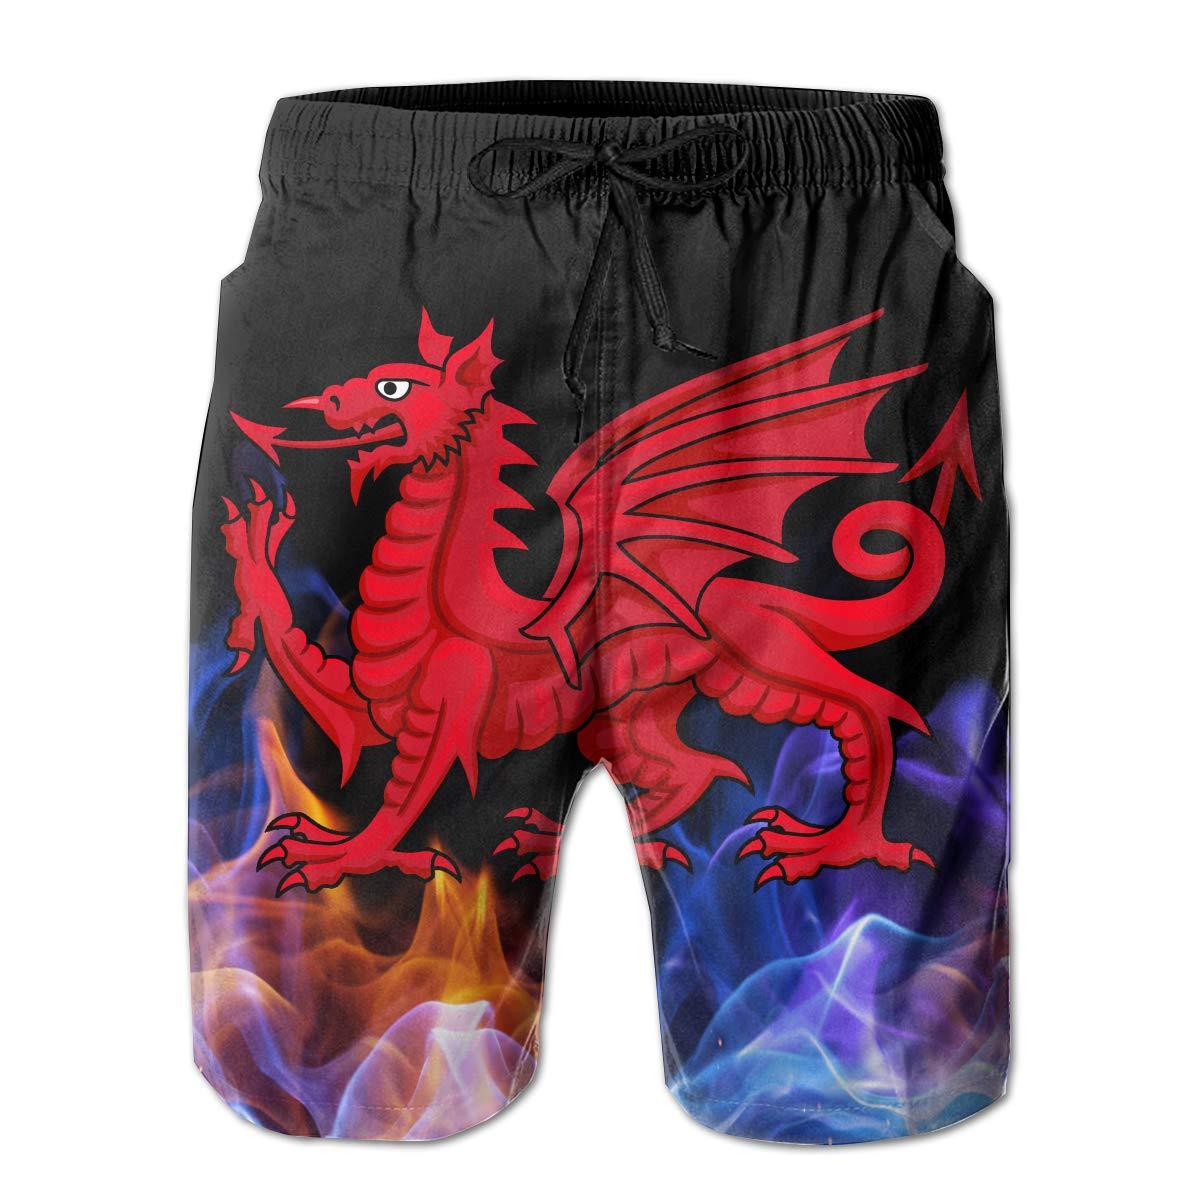 Welsh Dragon Mens Board Shorts Beach Swim Shorts Casual Classic Fit Trunks